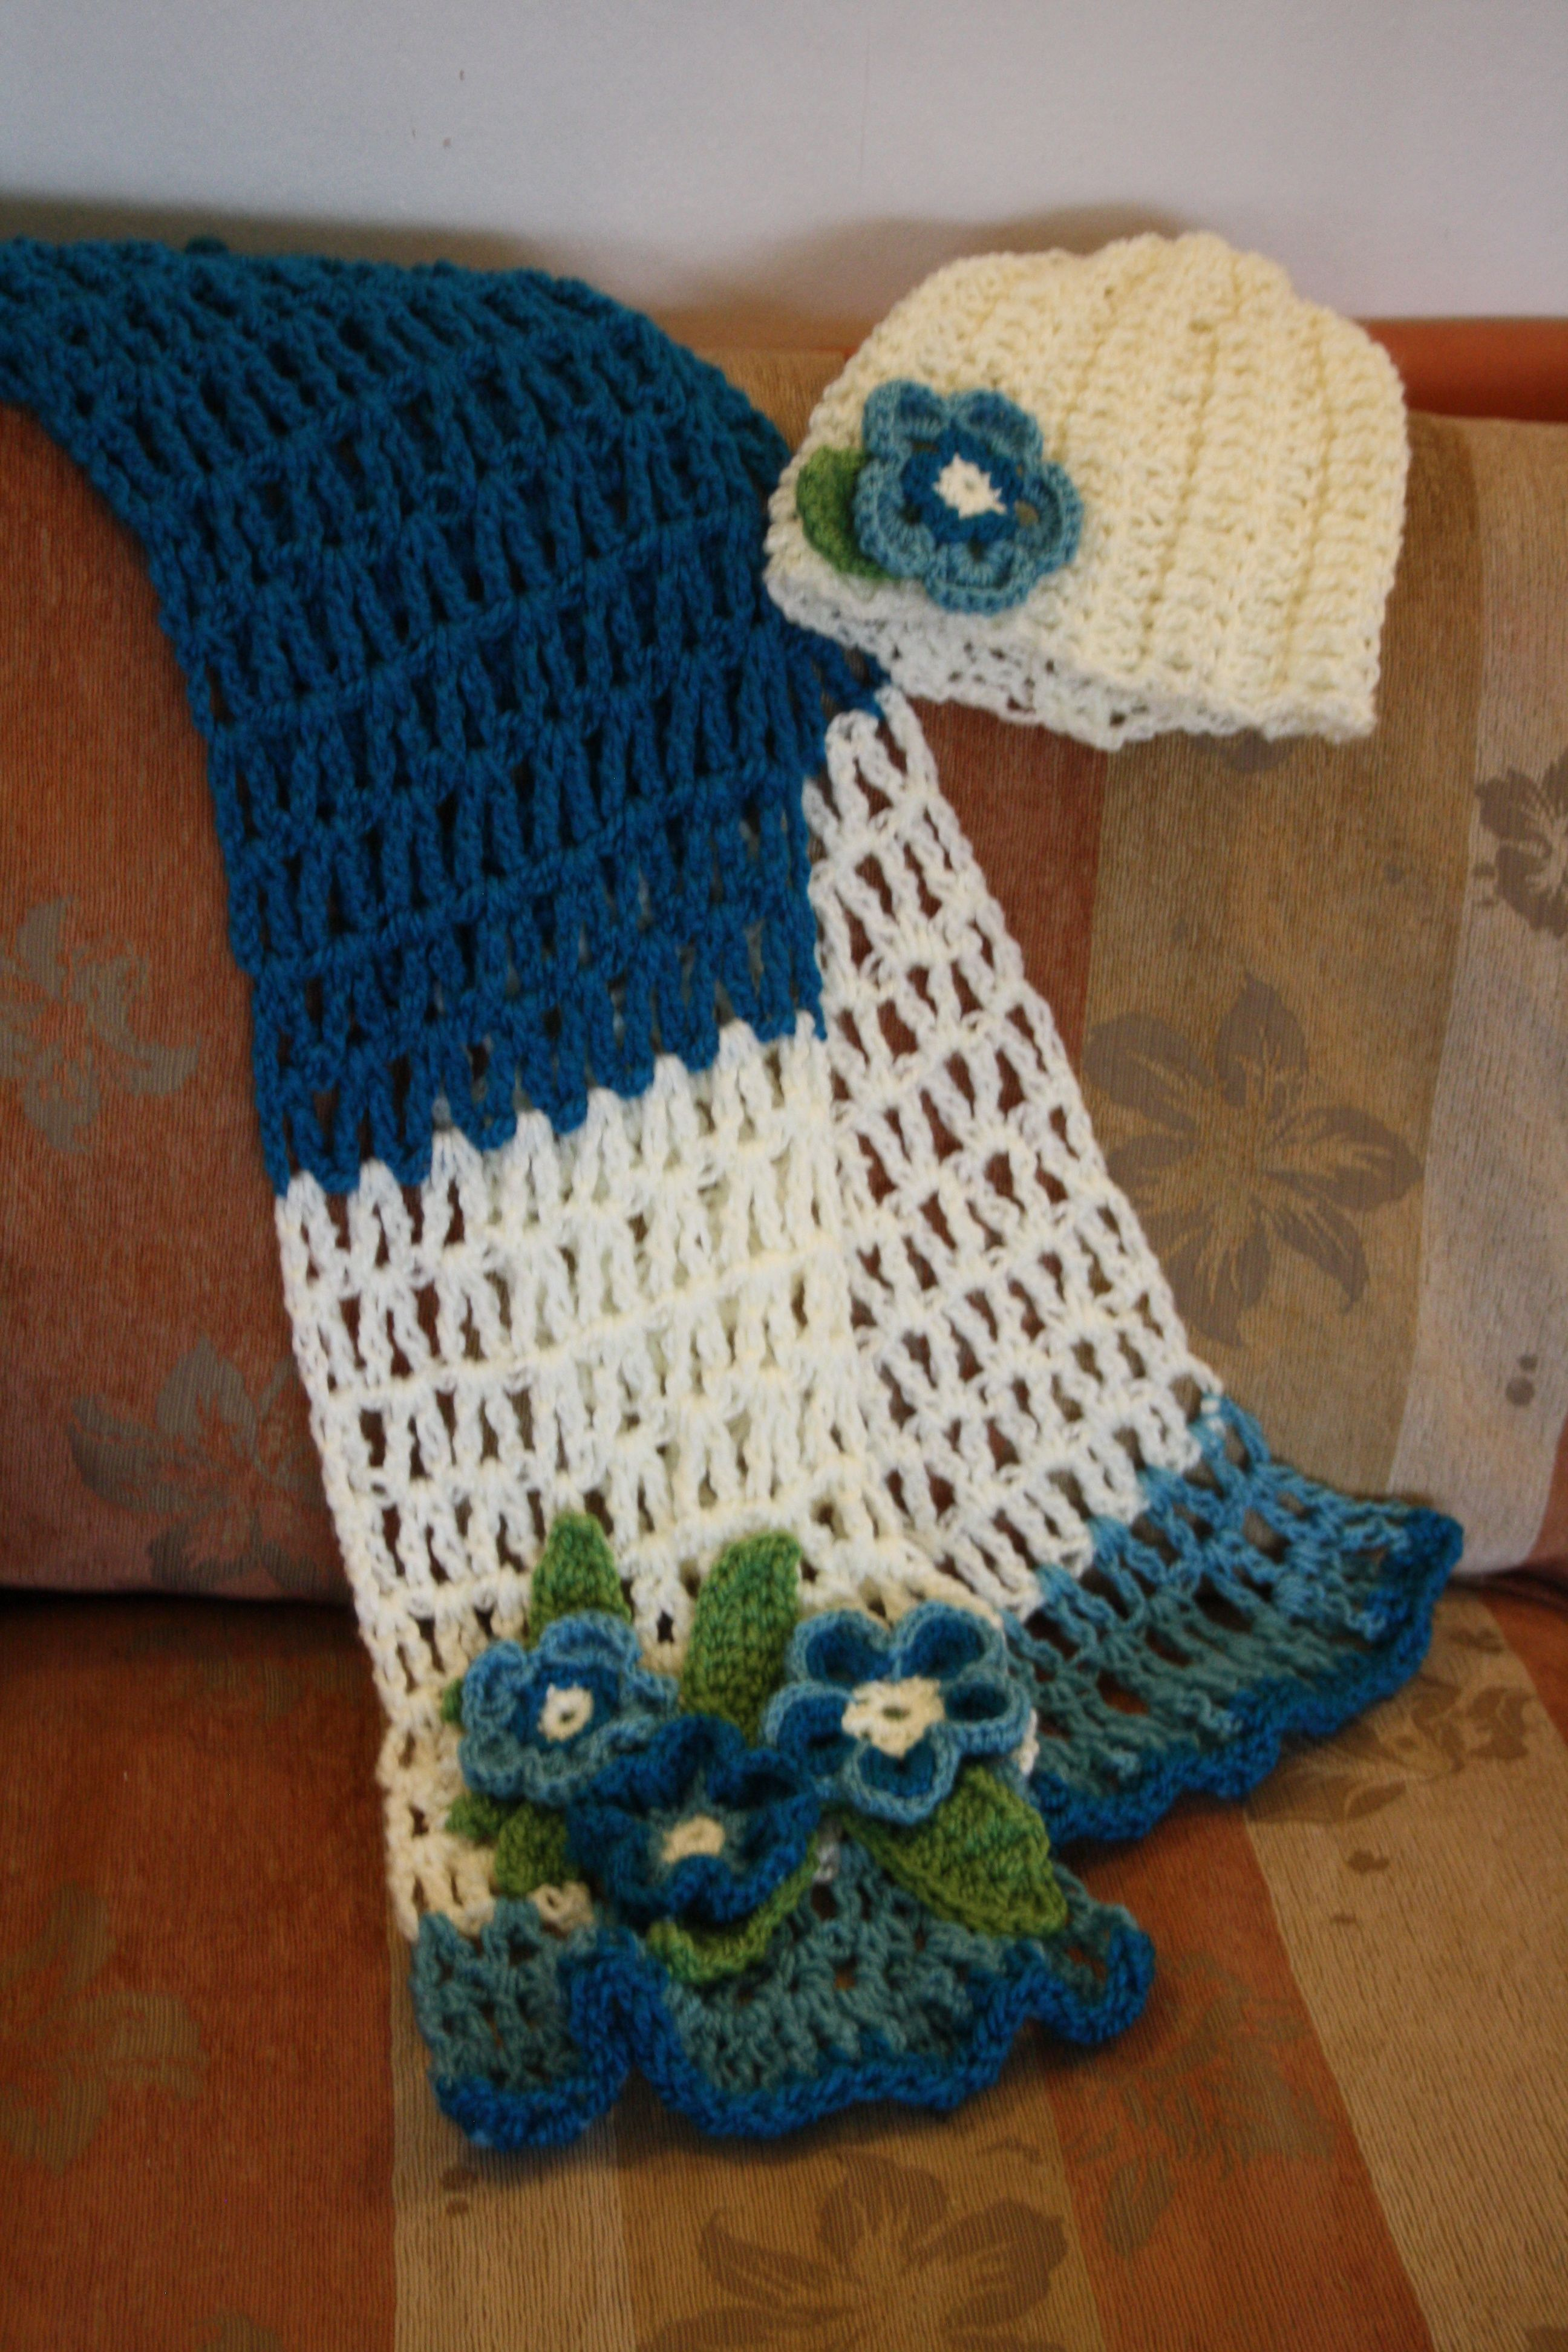 Crochet Hat Amp Scarf Sets On Pinterest Crocheted Hats